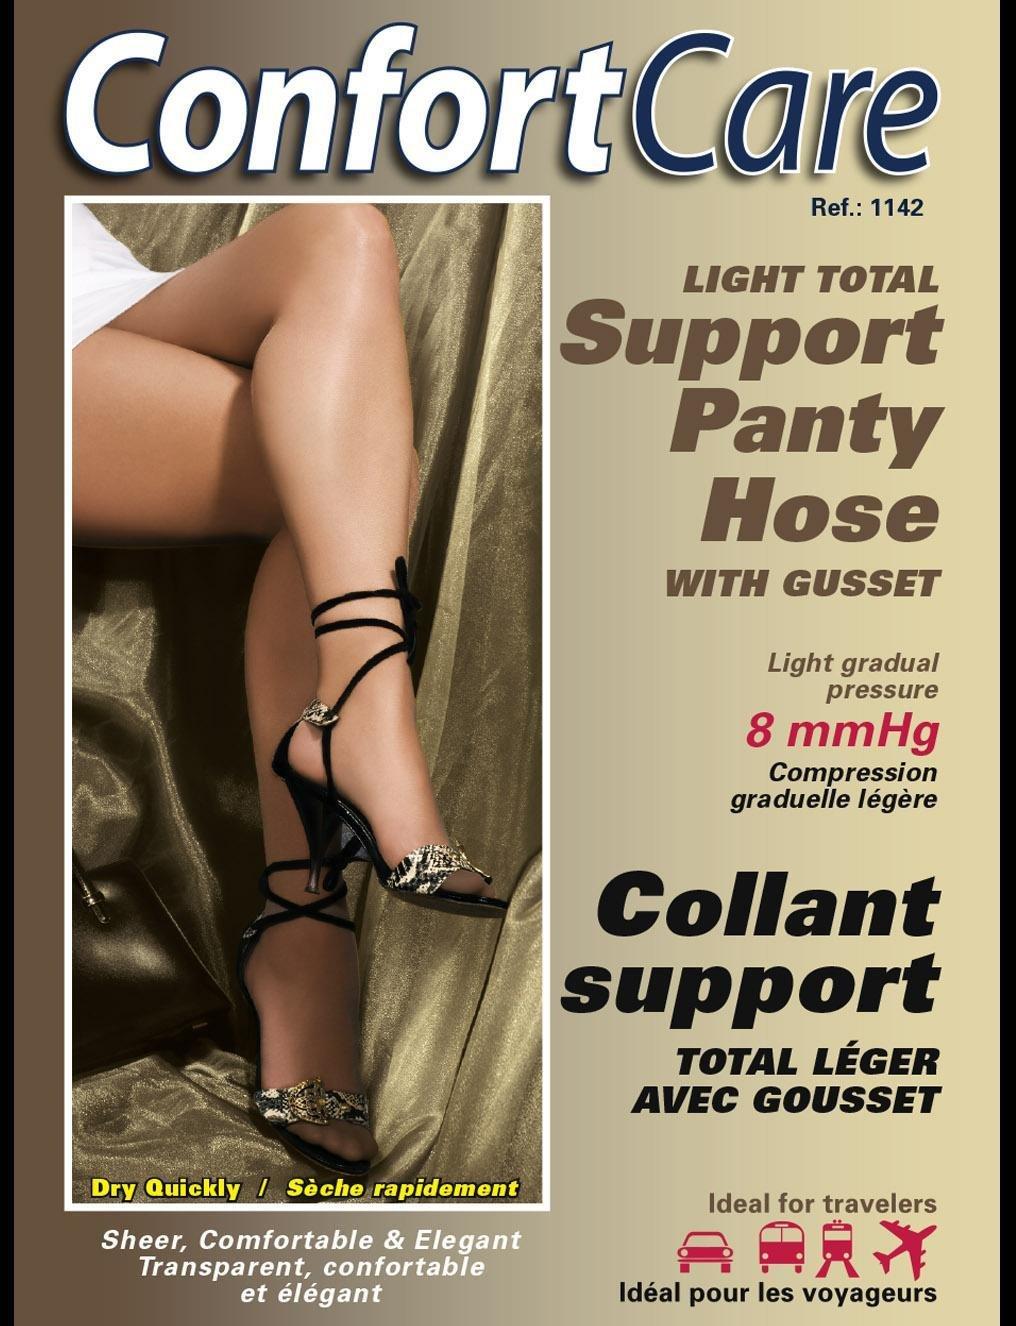 Elastic Support Panty Hose (8-10 mmHg) Light